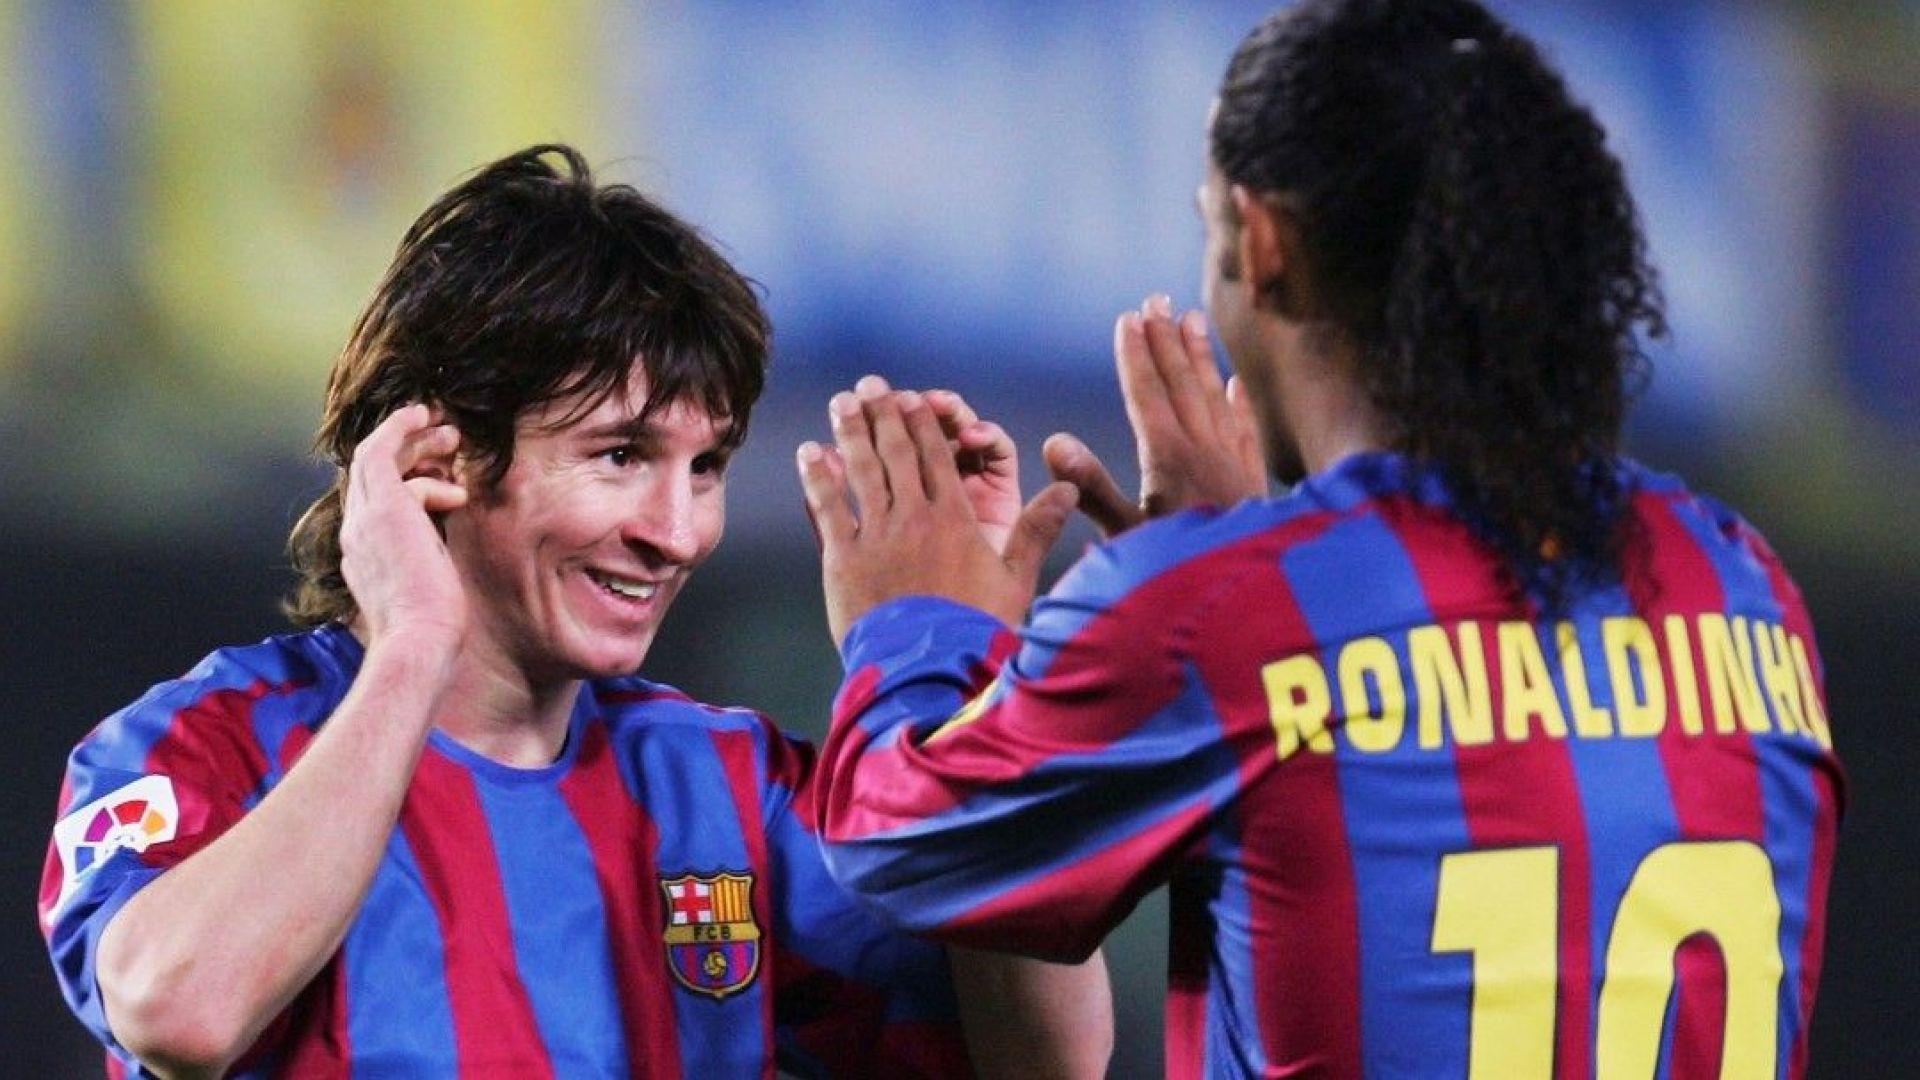 Интересно признание - продали Роналдиньо заради пиенето и Меси